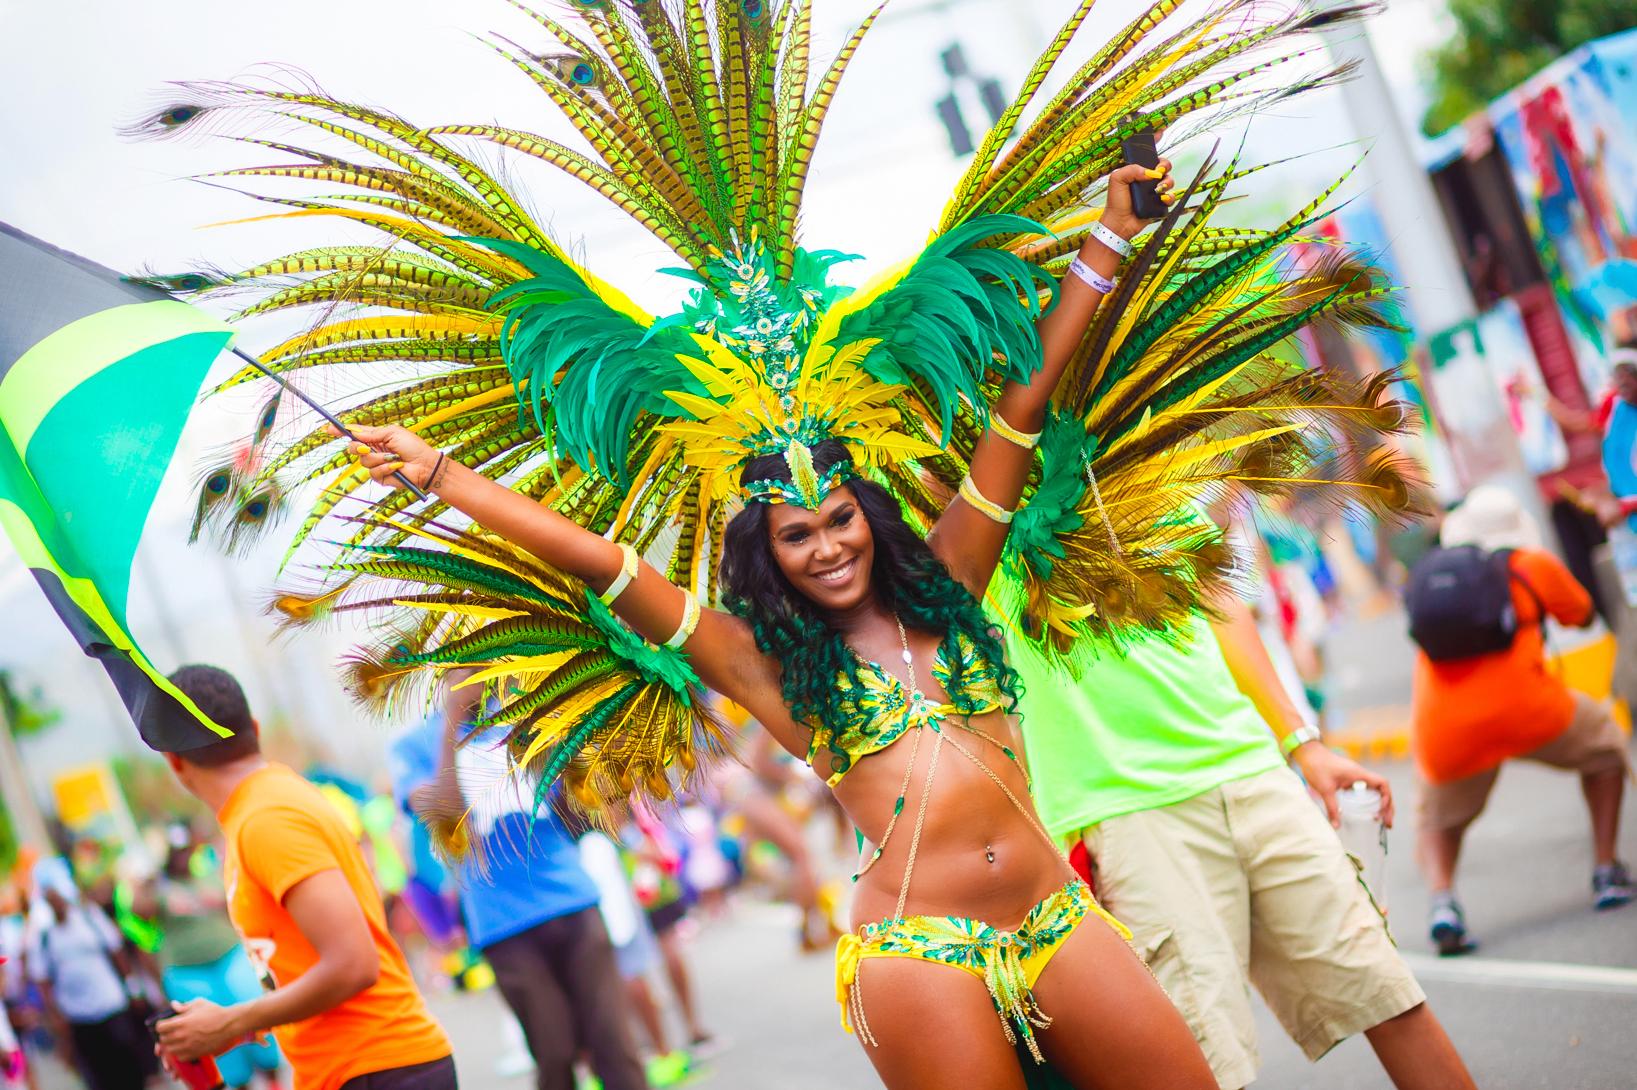 jamaican festivals and celebrations - photo #46